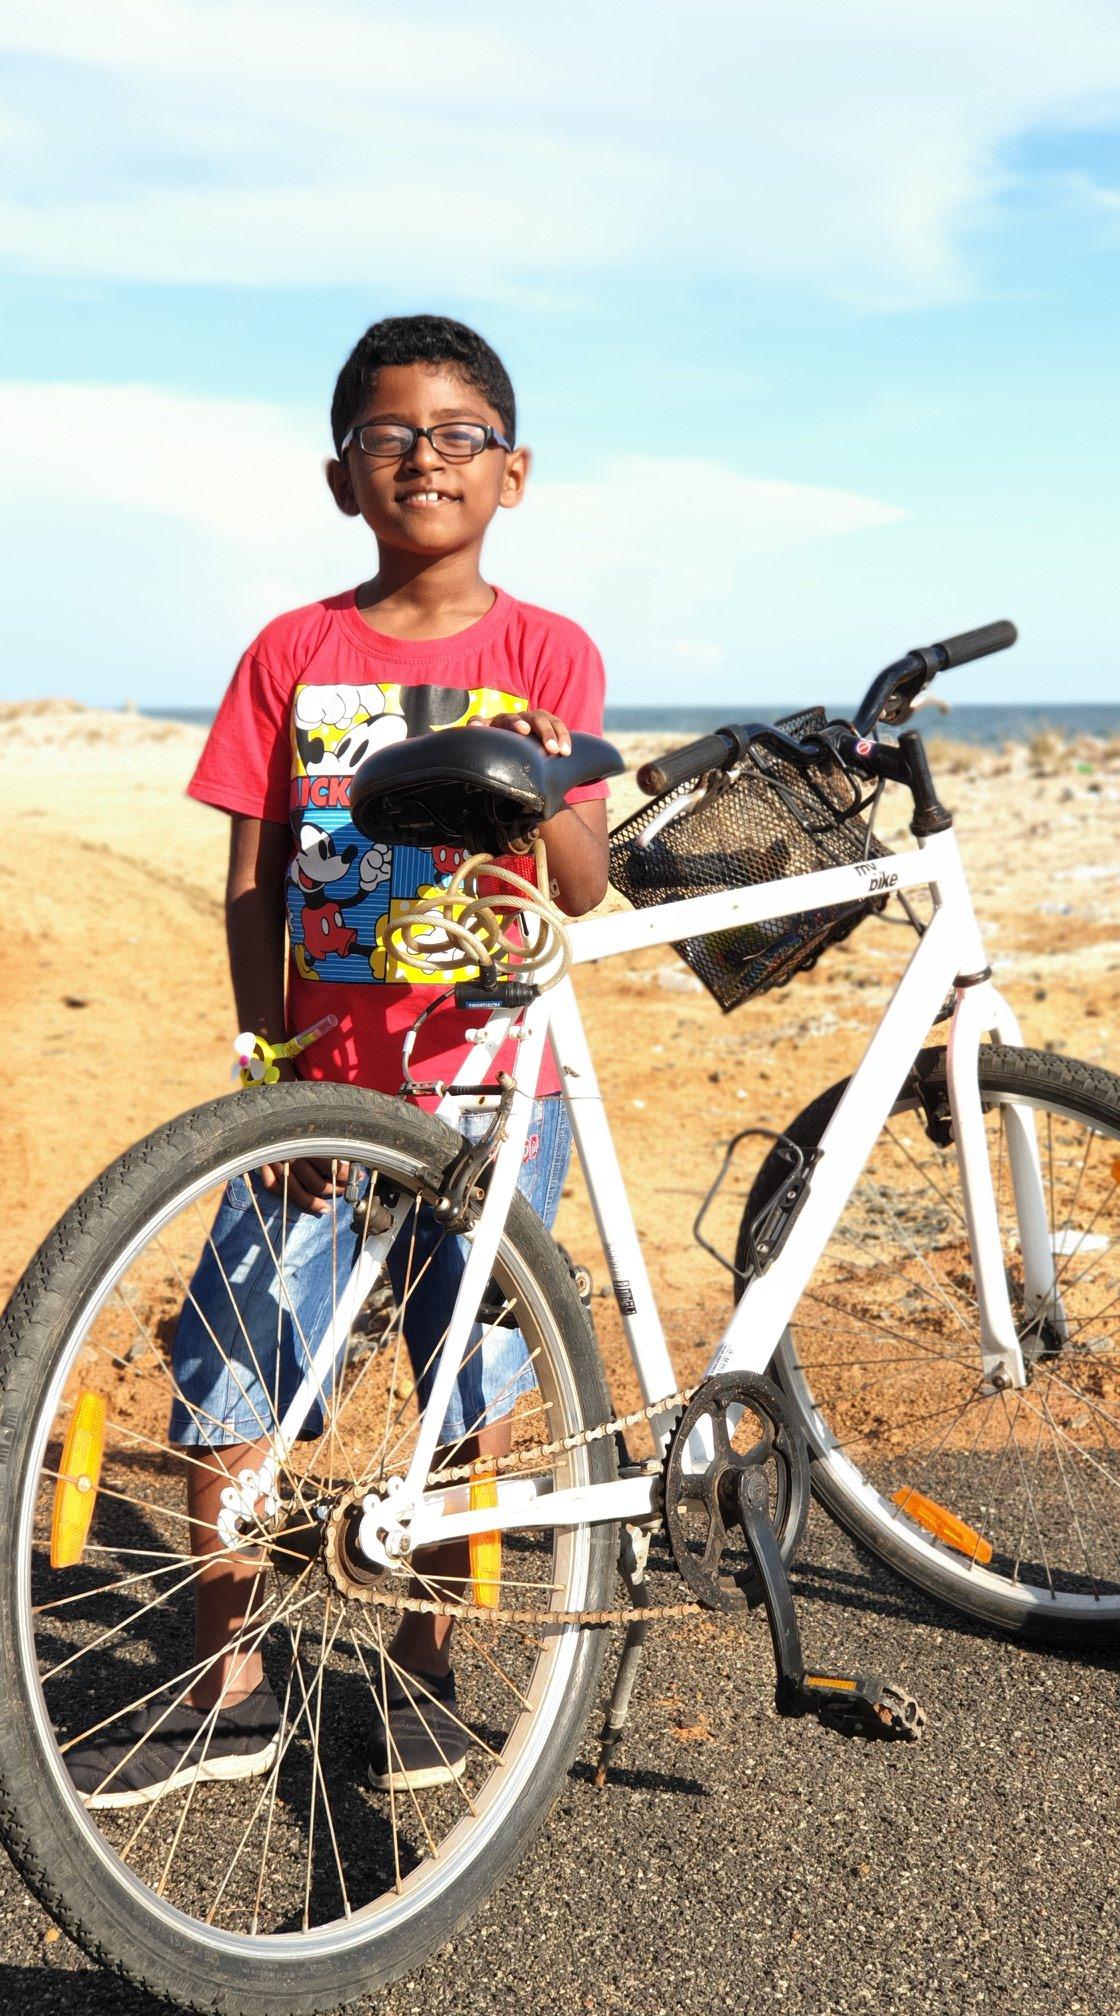 Nandu and I cycled in villages near Rameswaram